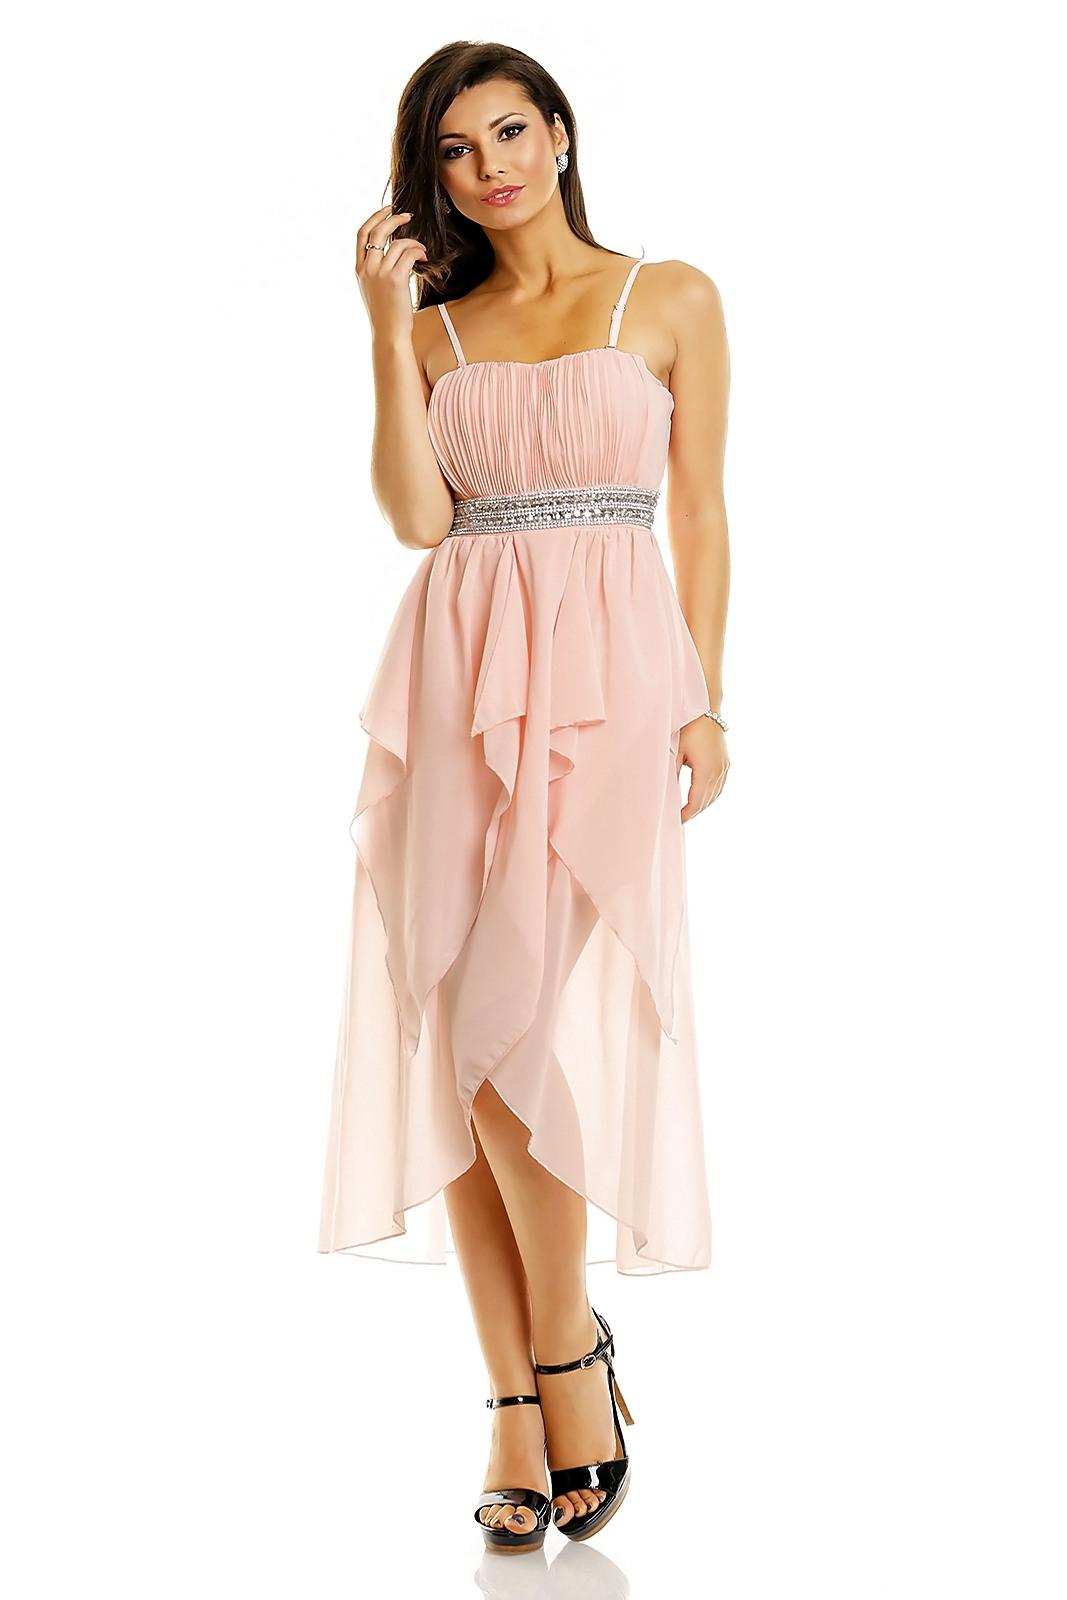 10 Coolste Kleid Rosa Kurz Ärmel10 Einzigartig Kleid Rosa Kurz Design